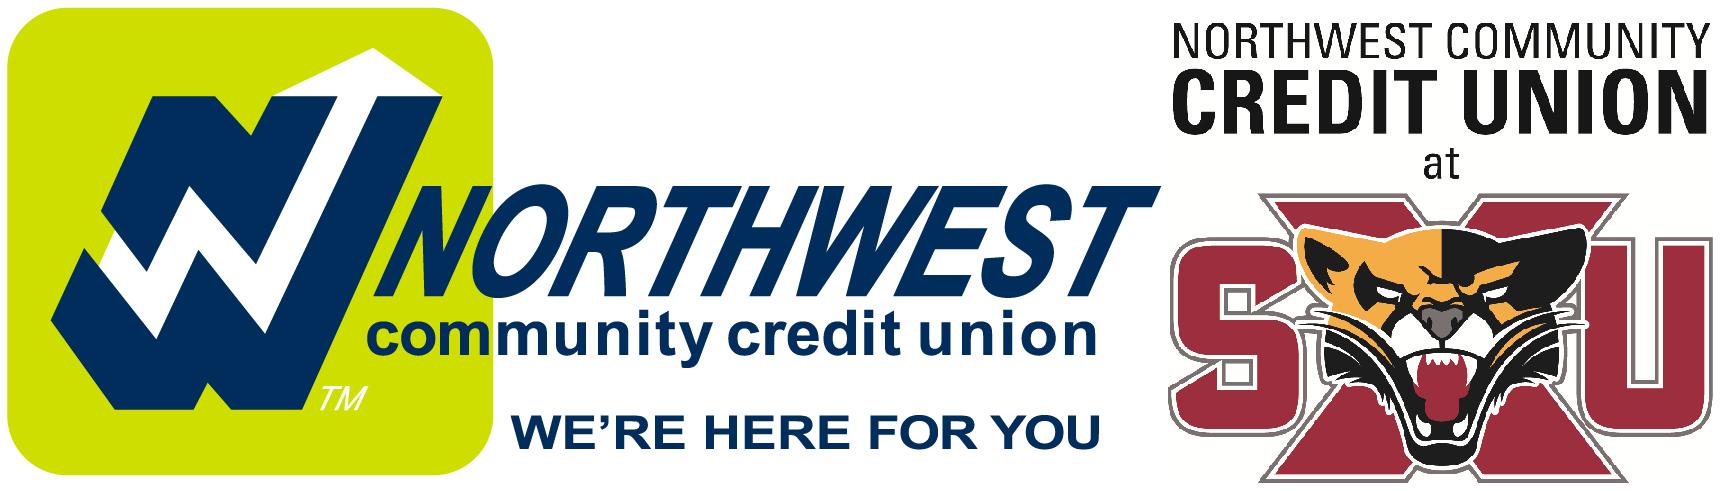 Northwestcommunitycu logo 2013 web